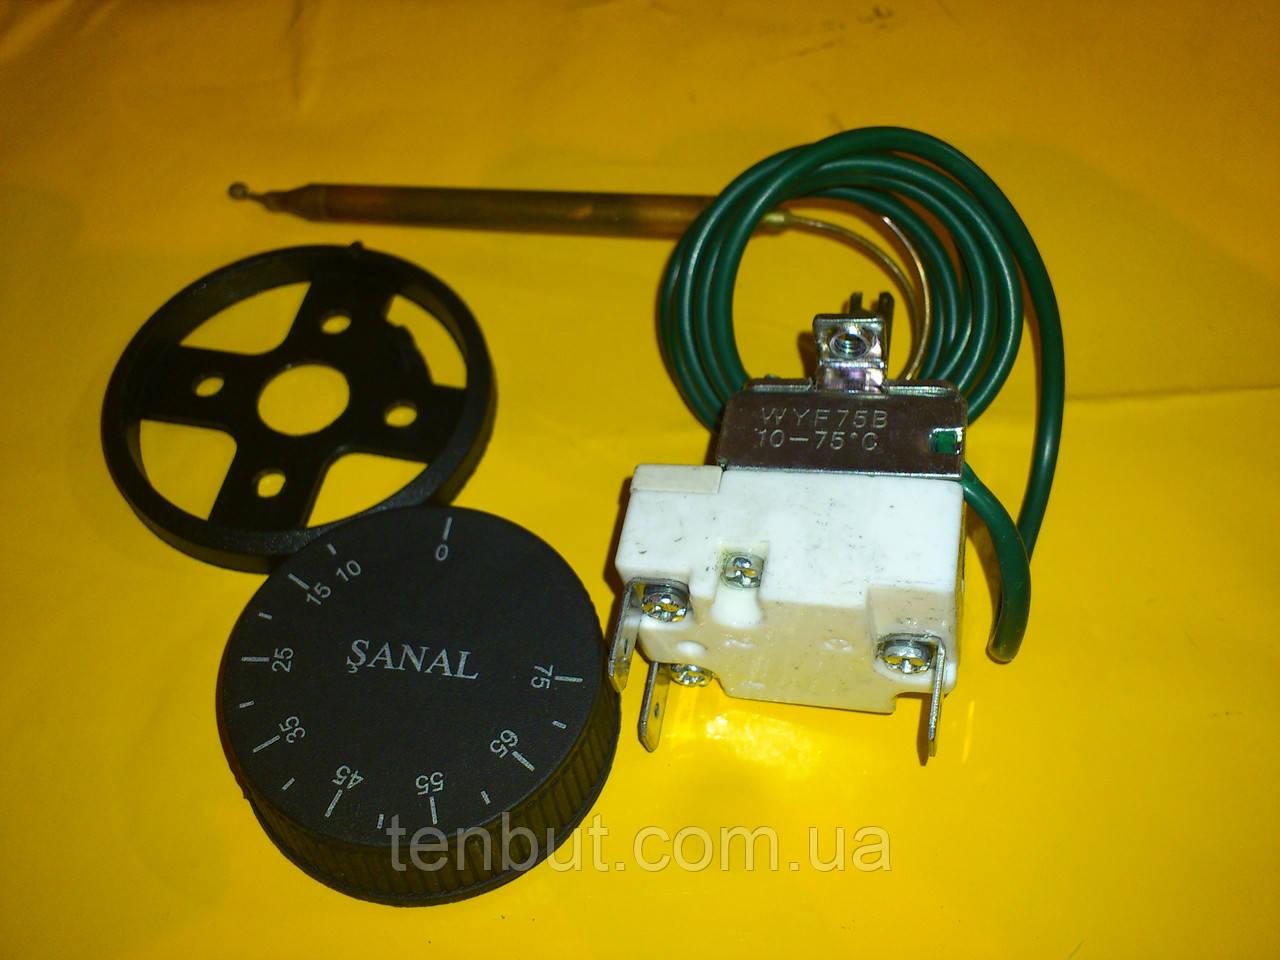 Терморегулятор температуры FSTB ( SANAL ) 10-75 С° капилярный 16 А / 250 В. производство Турция